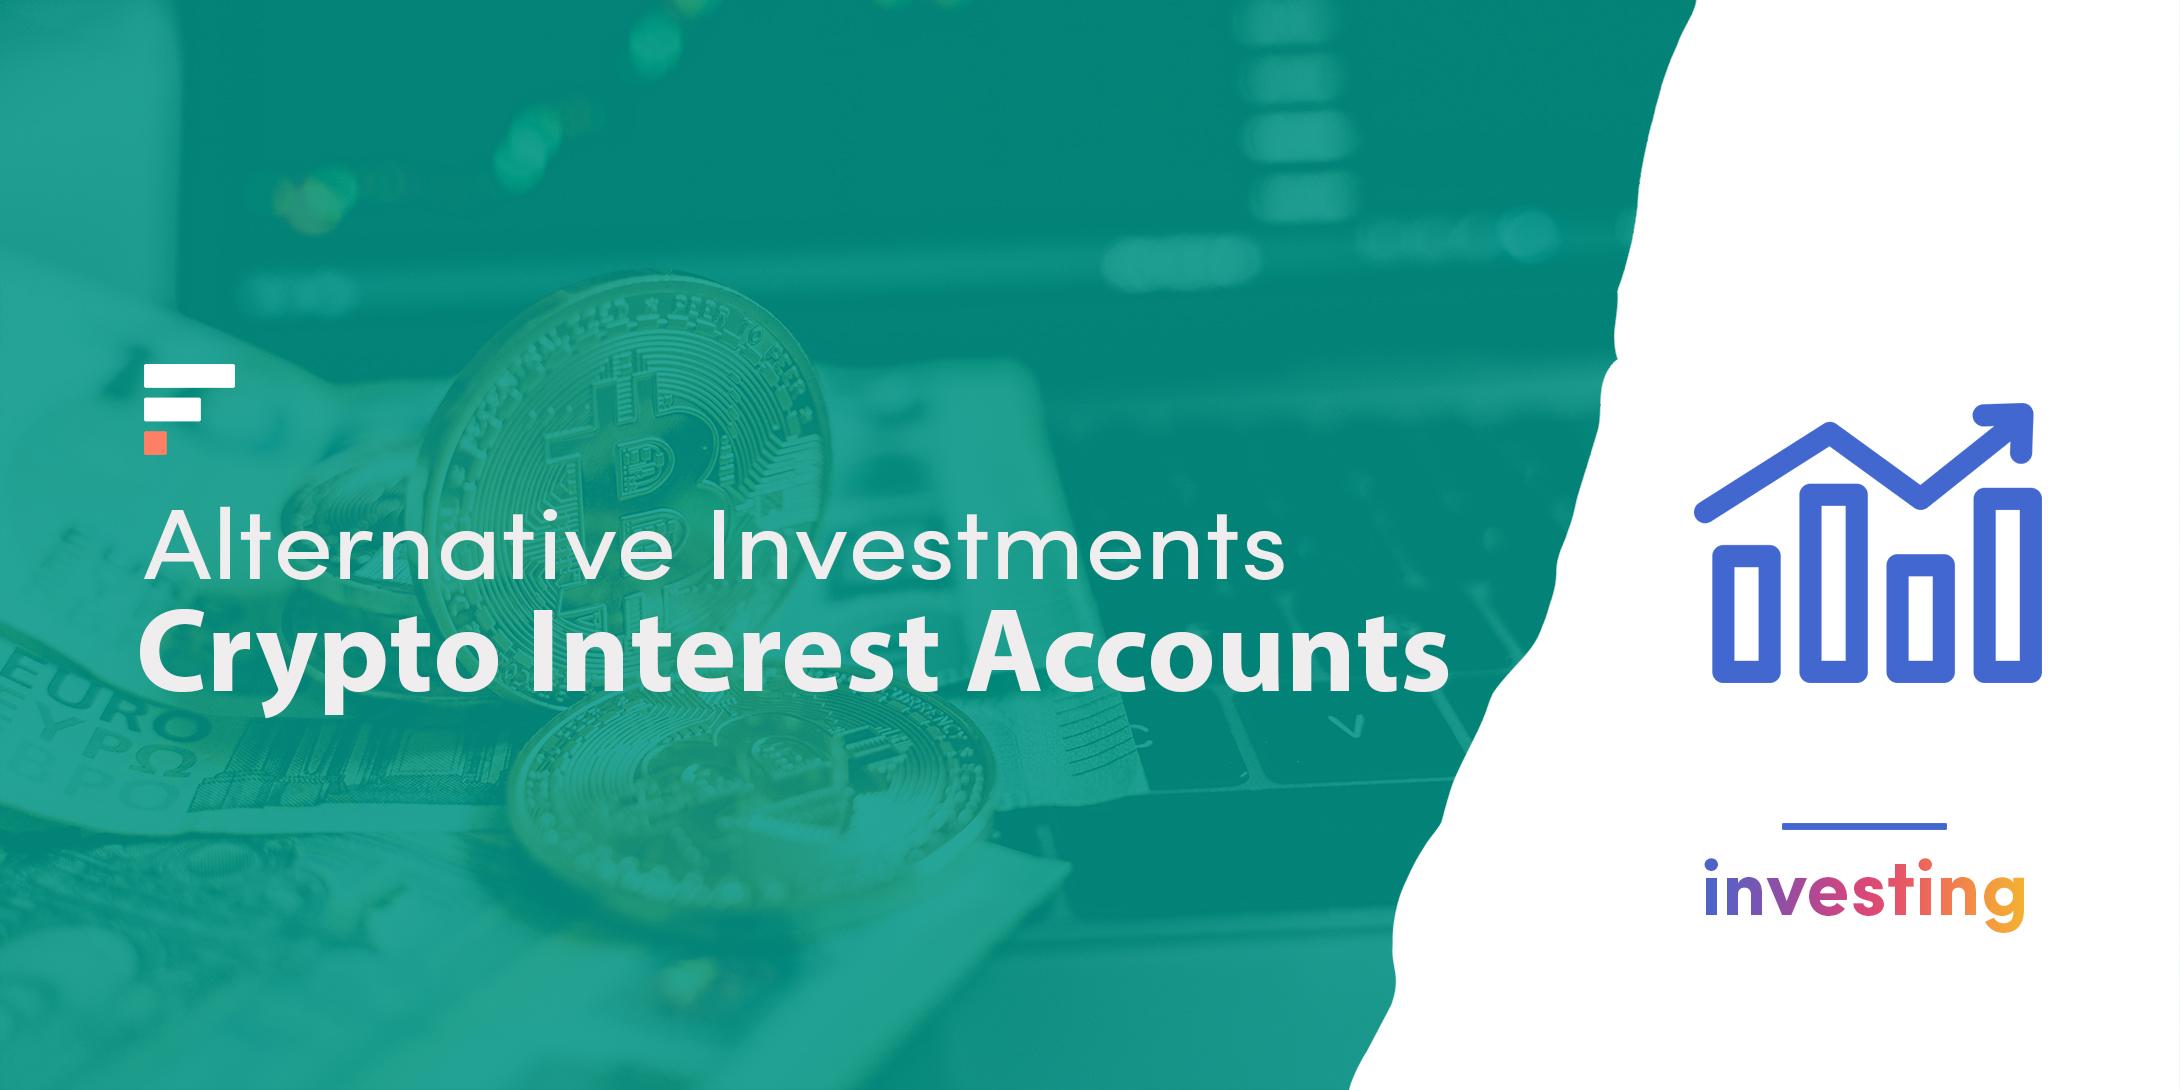 Alternative Investments: Crypto Interest Accounts